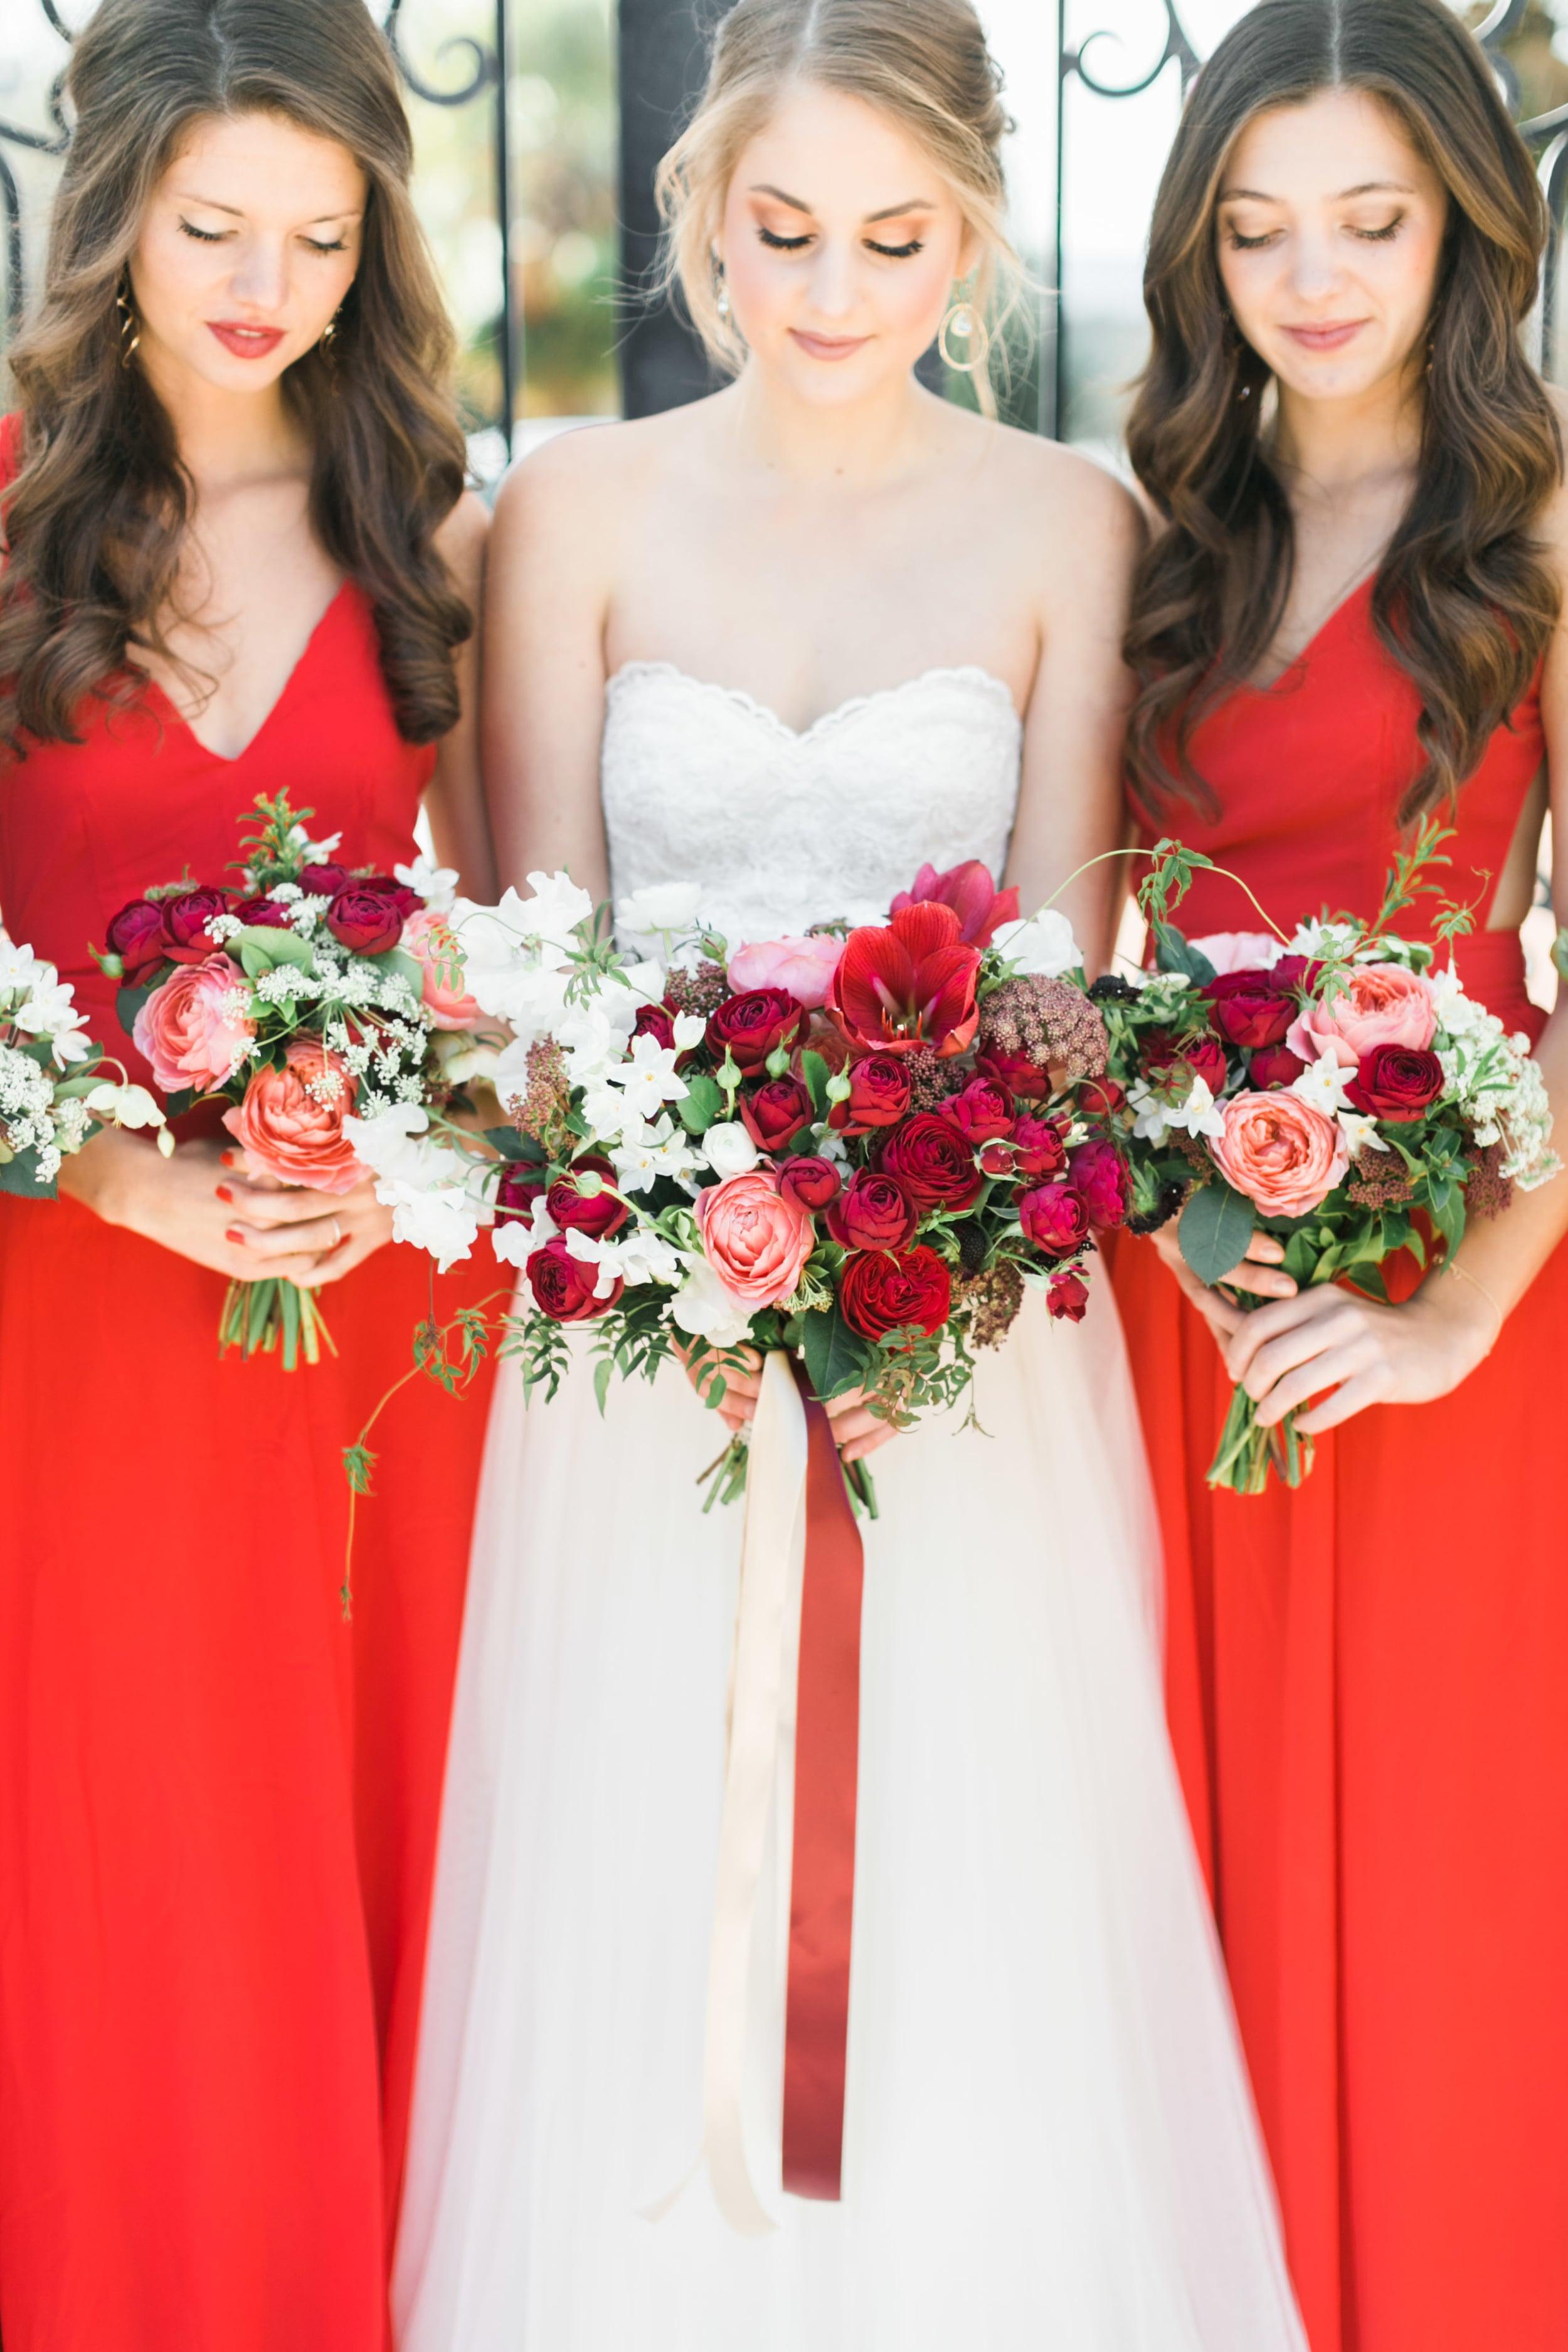 Natalie_Schutt_Photography_Winter_Wedding_San_Luis_Obispo-46.jpg